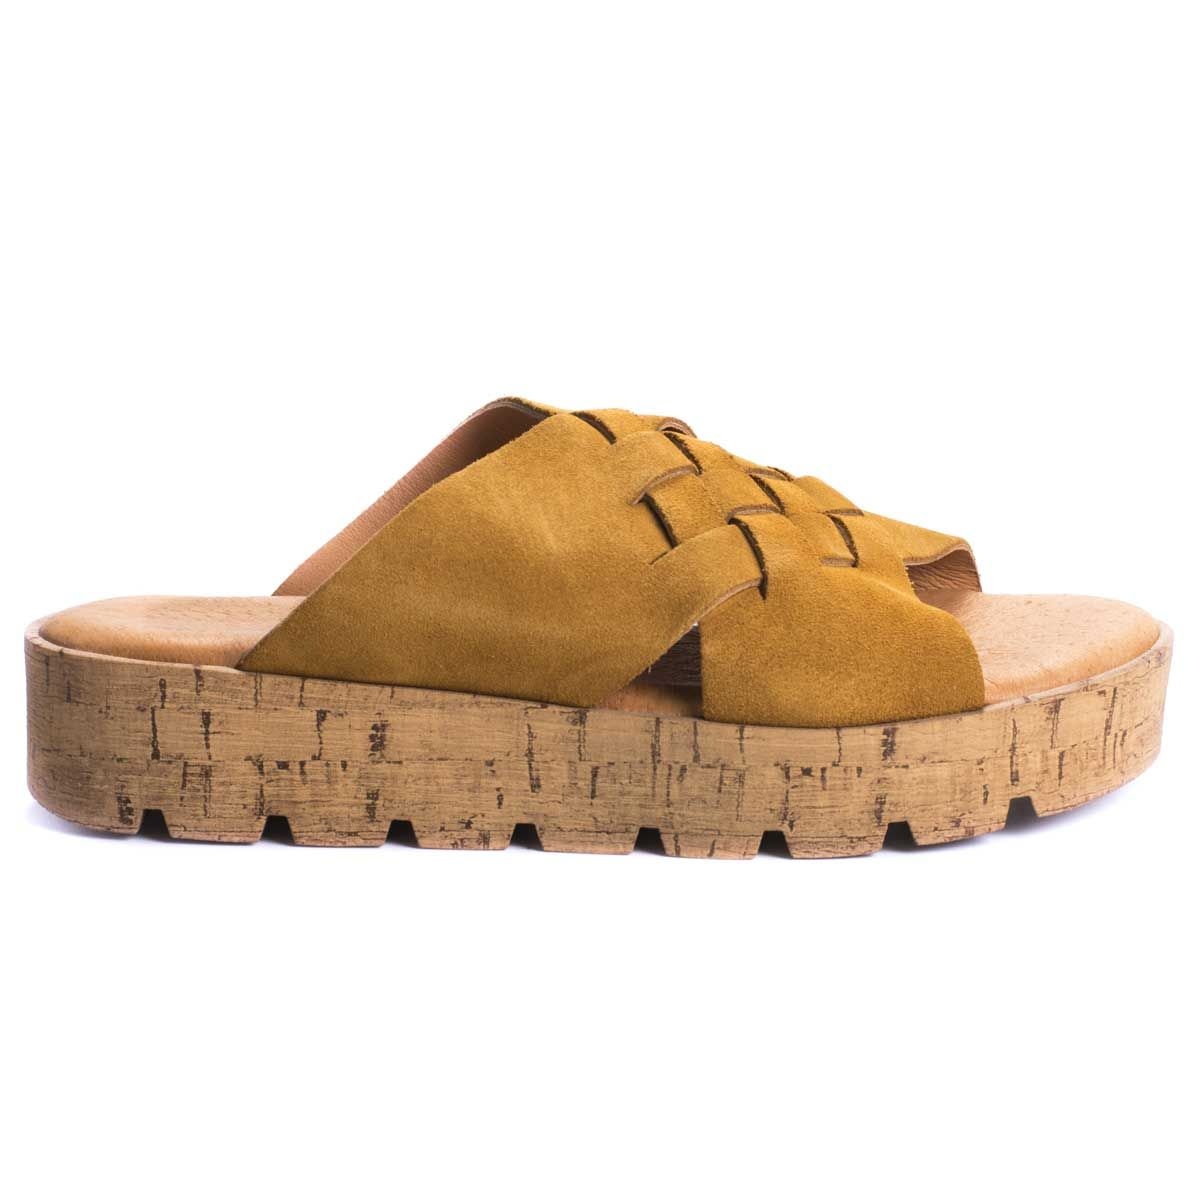 Purapiel Woven Flatform Sandal in Camel